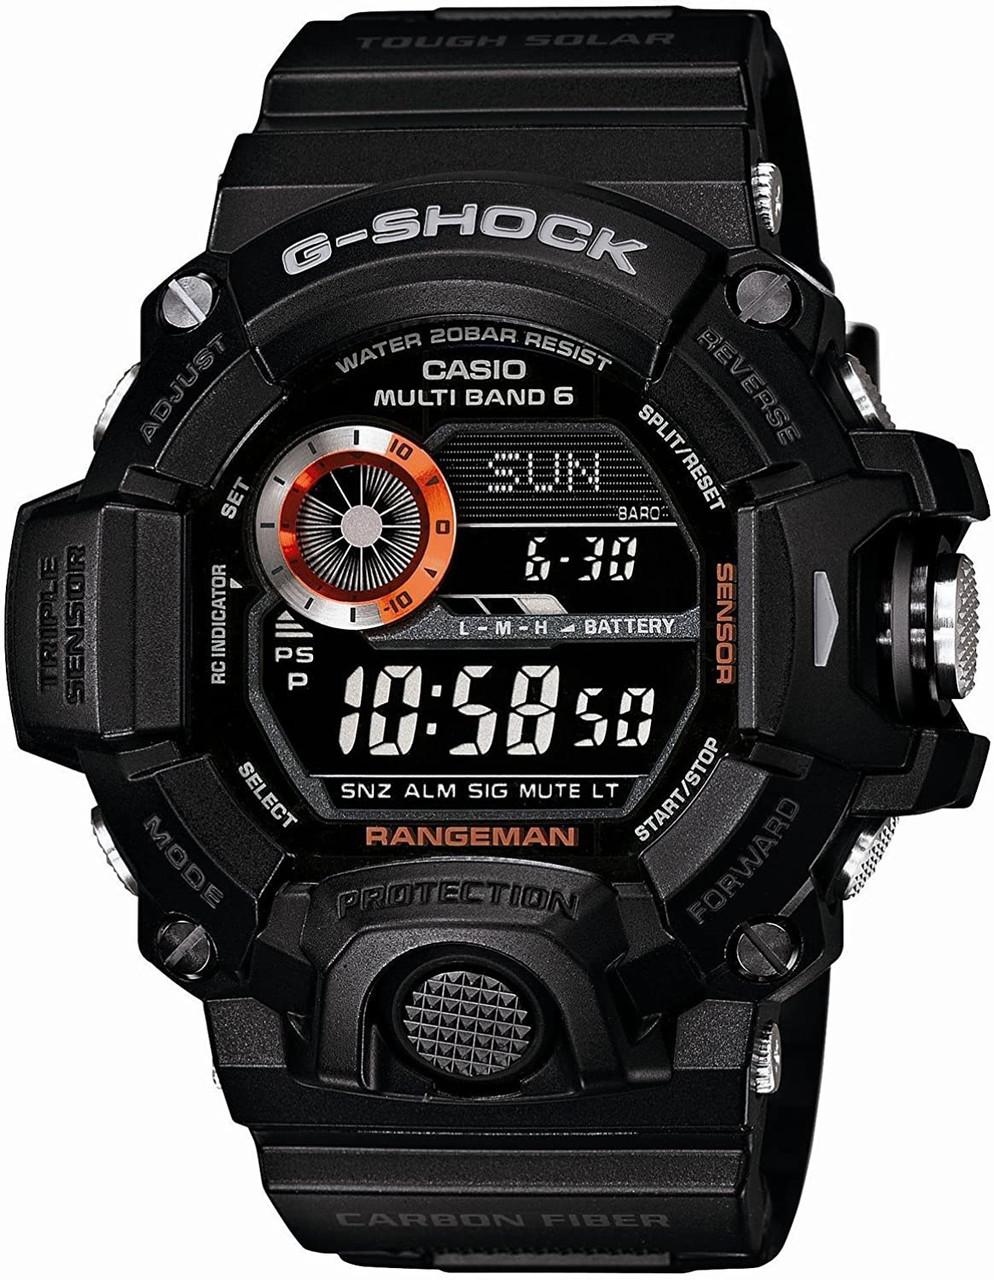 Casio G-Shock Rangeman GW-9400BJ-1JF